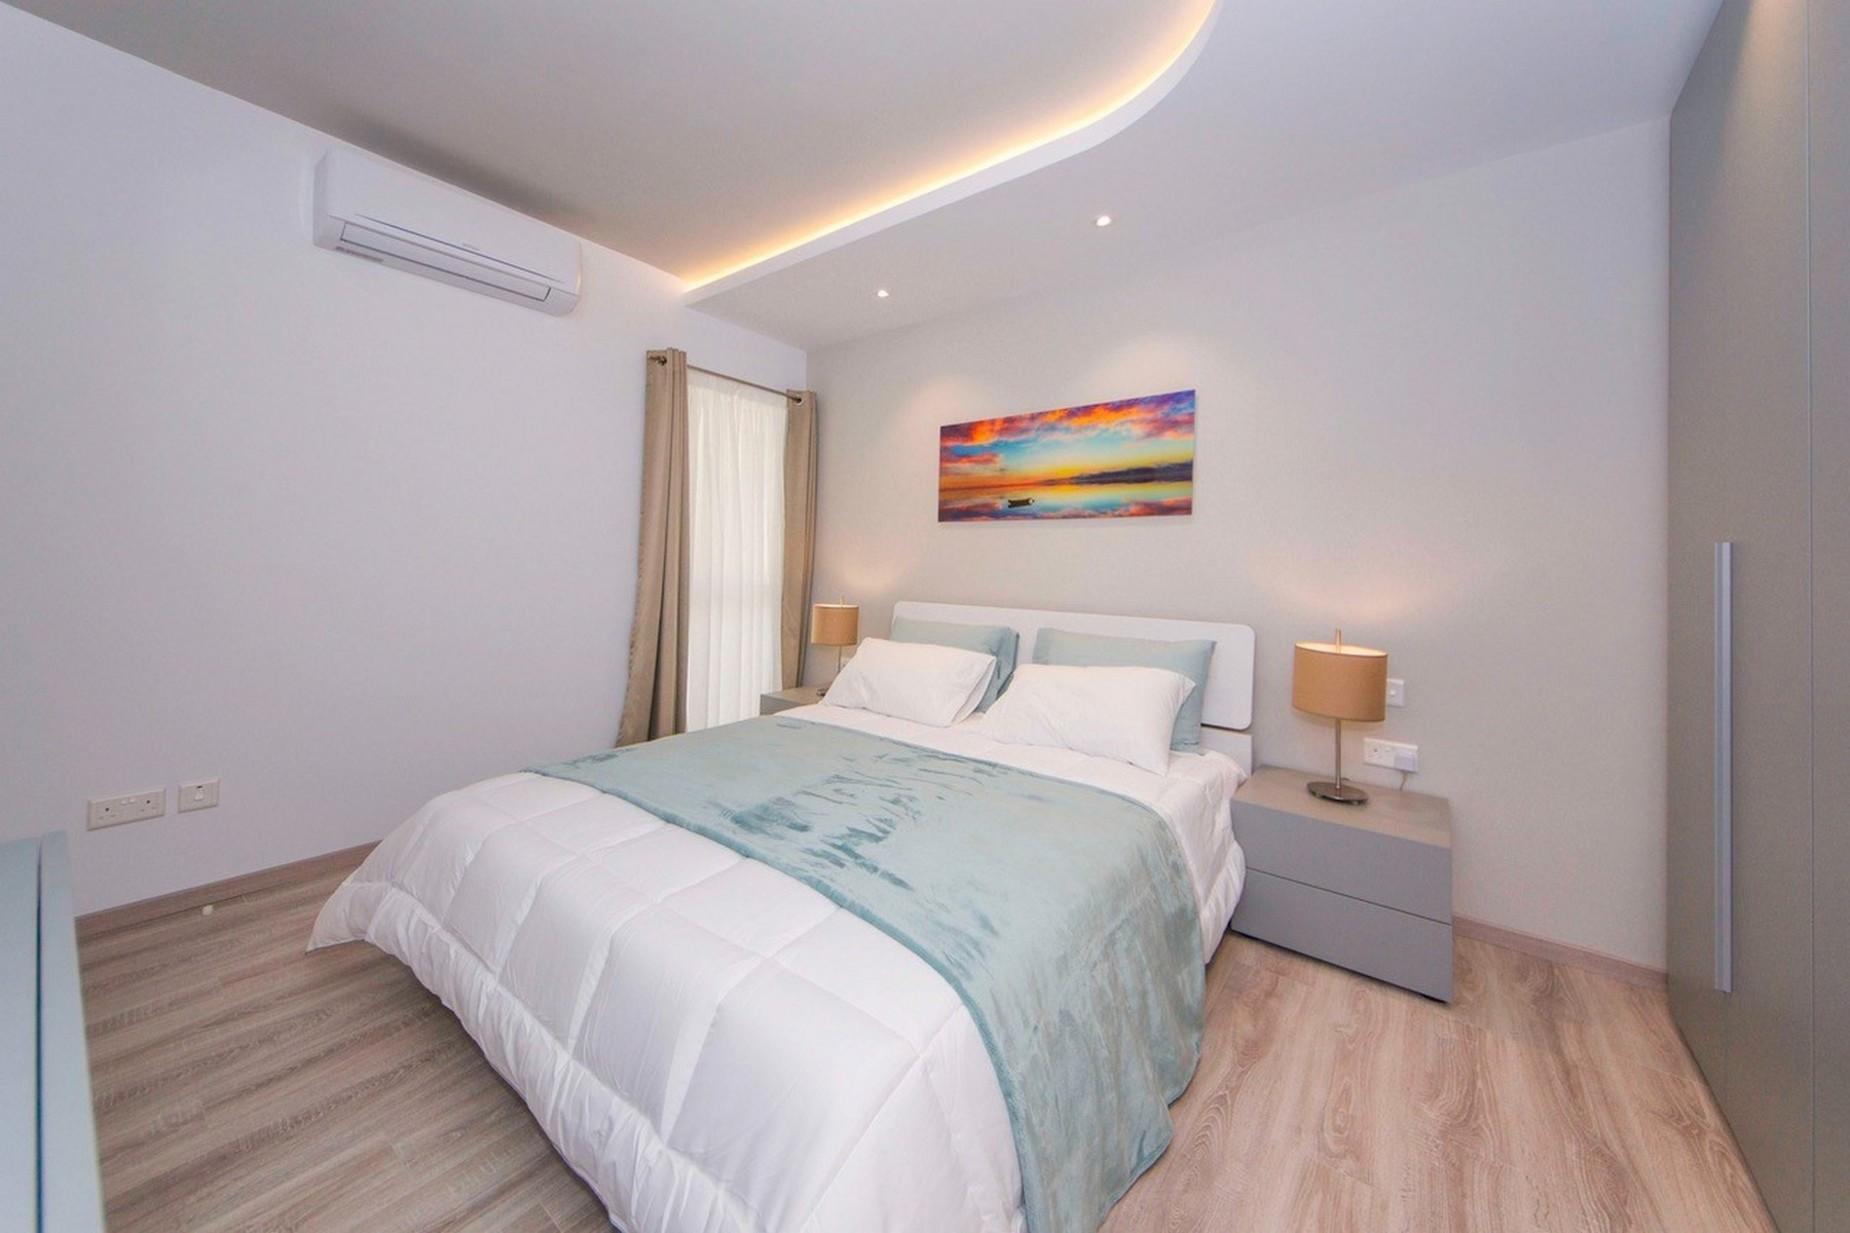 2 bed Apartment For Rent in Qawra, Qawra - thumb 14